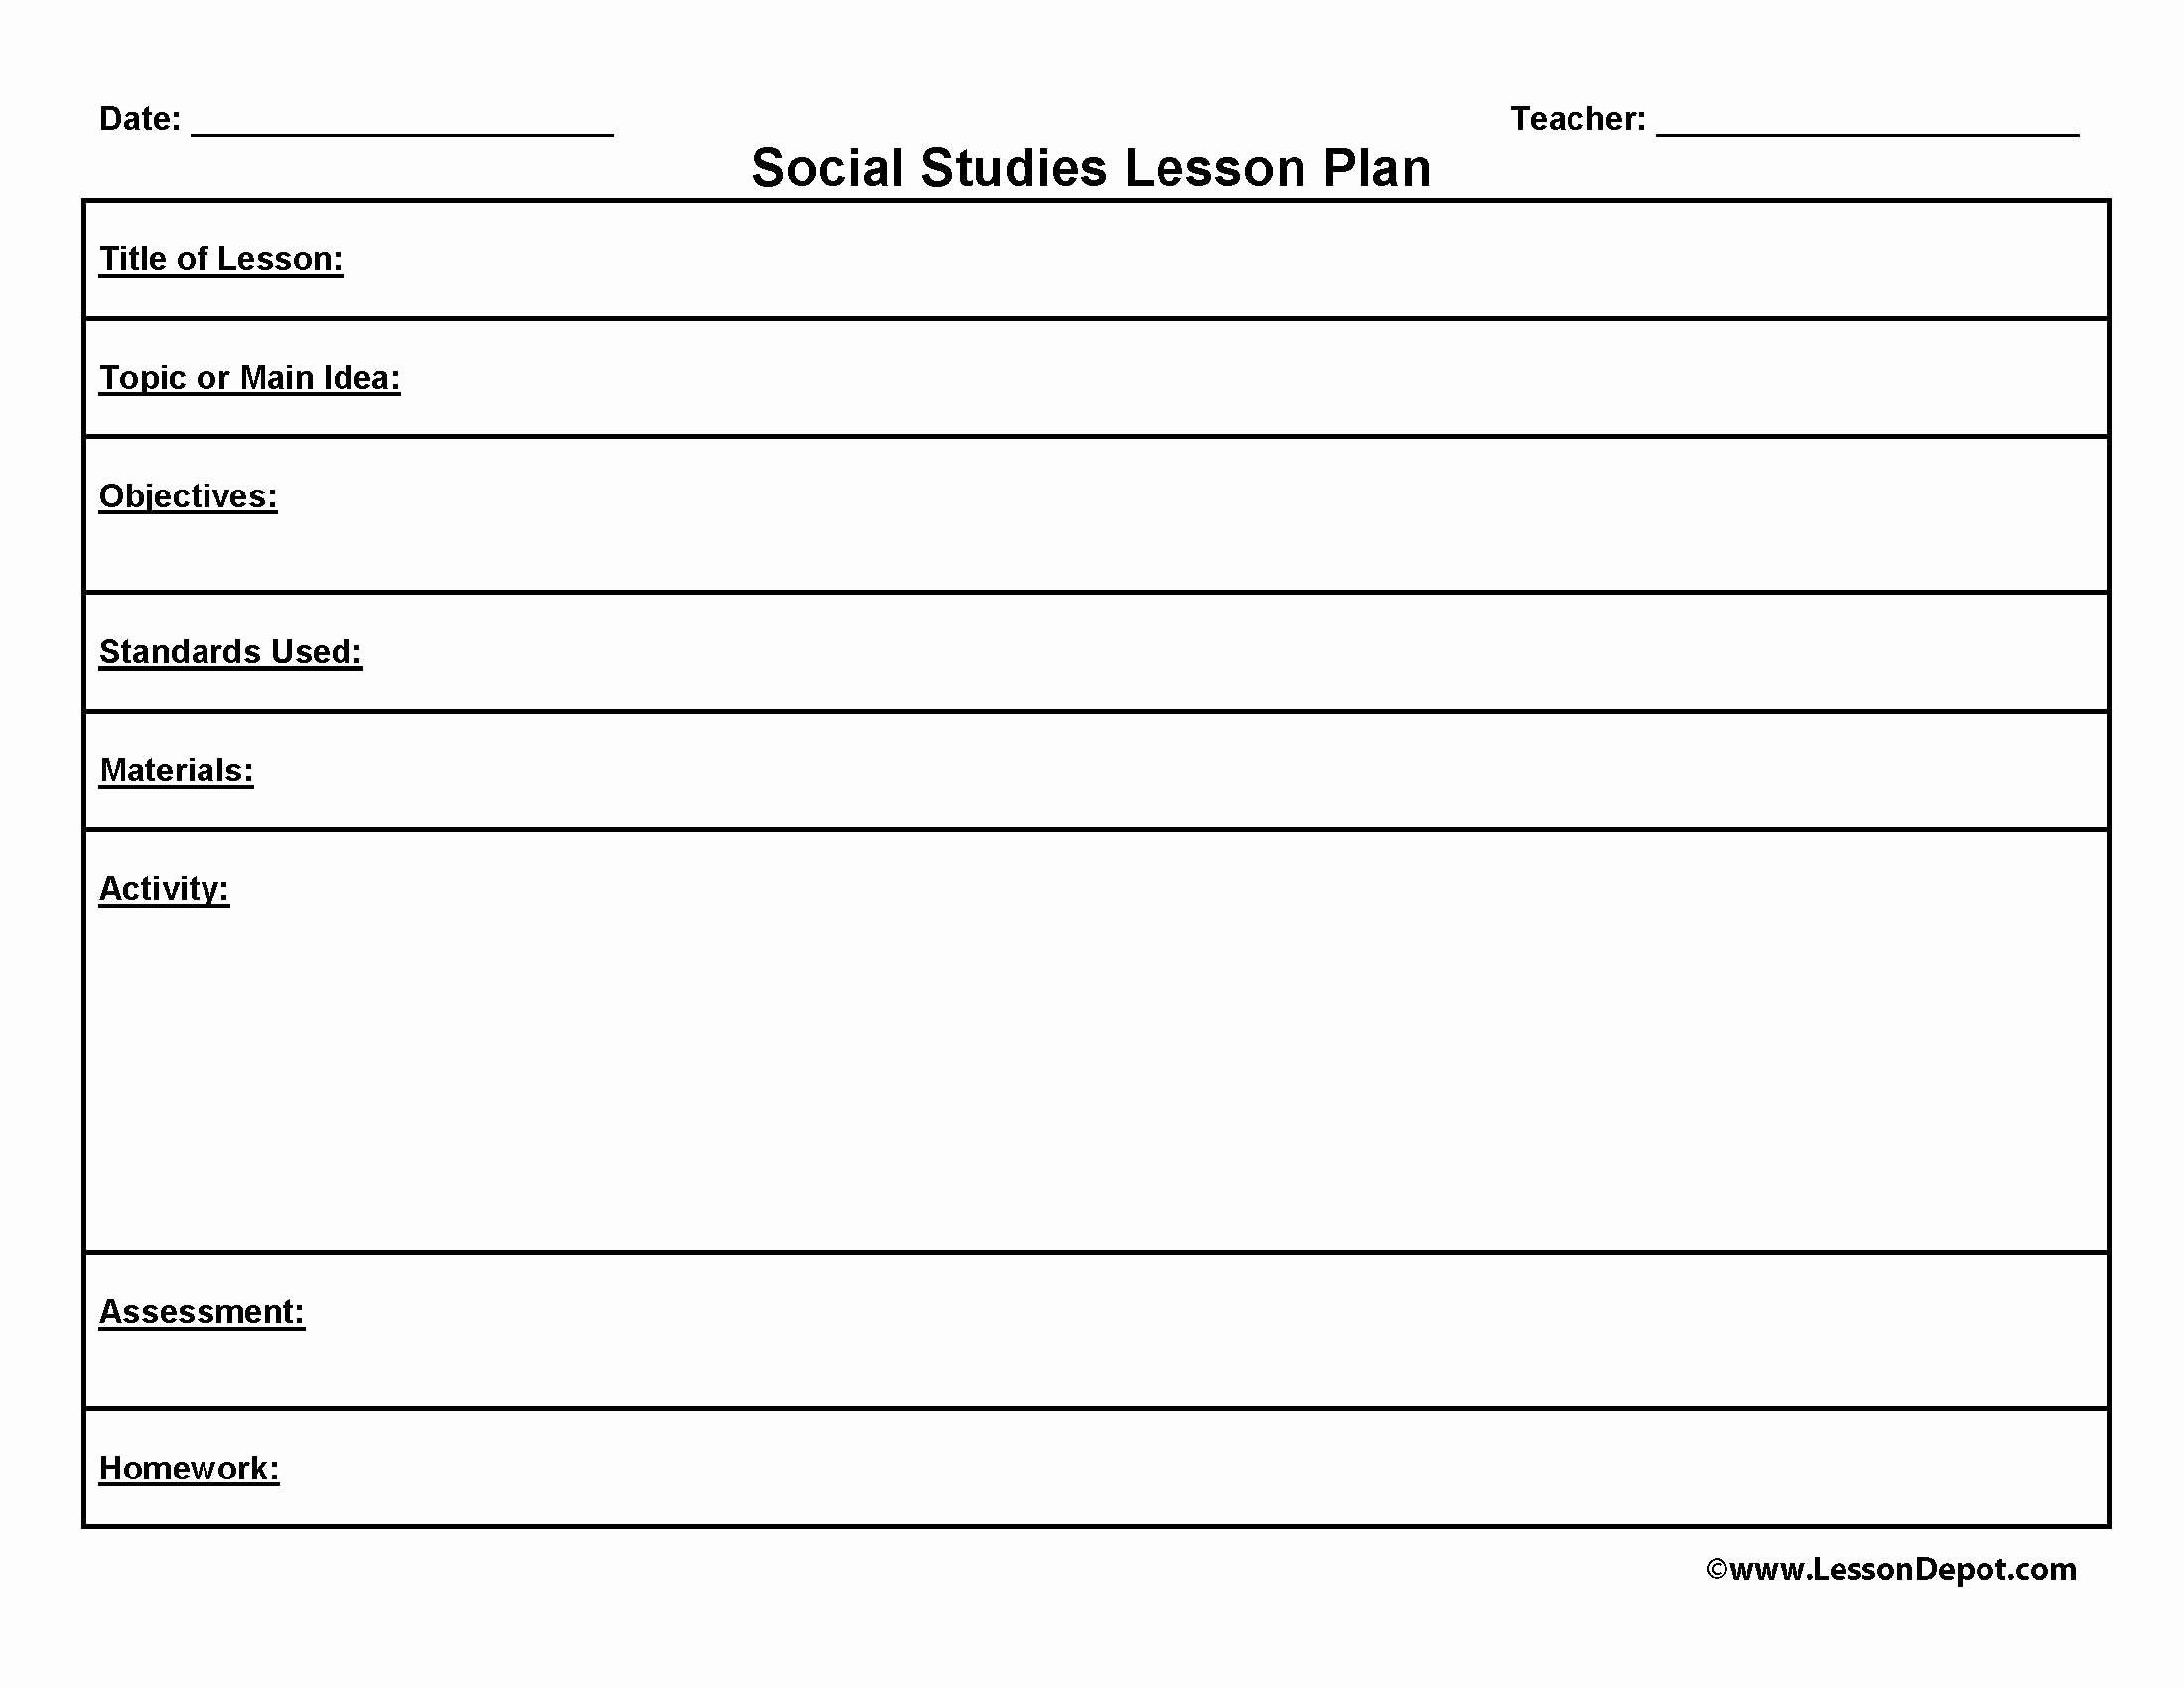 Lesson Plan Outline Template Elegant Printable Blank Lesson Plans form